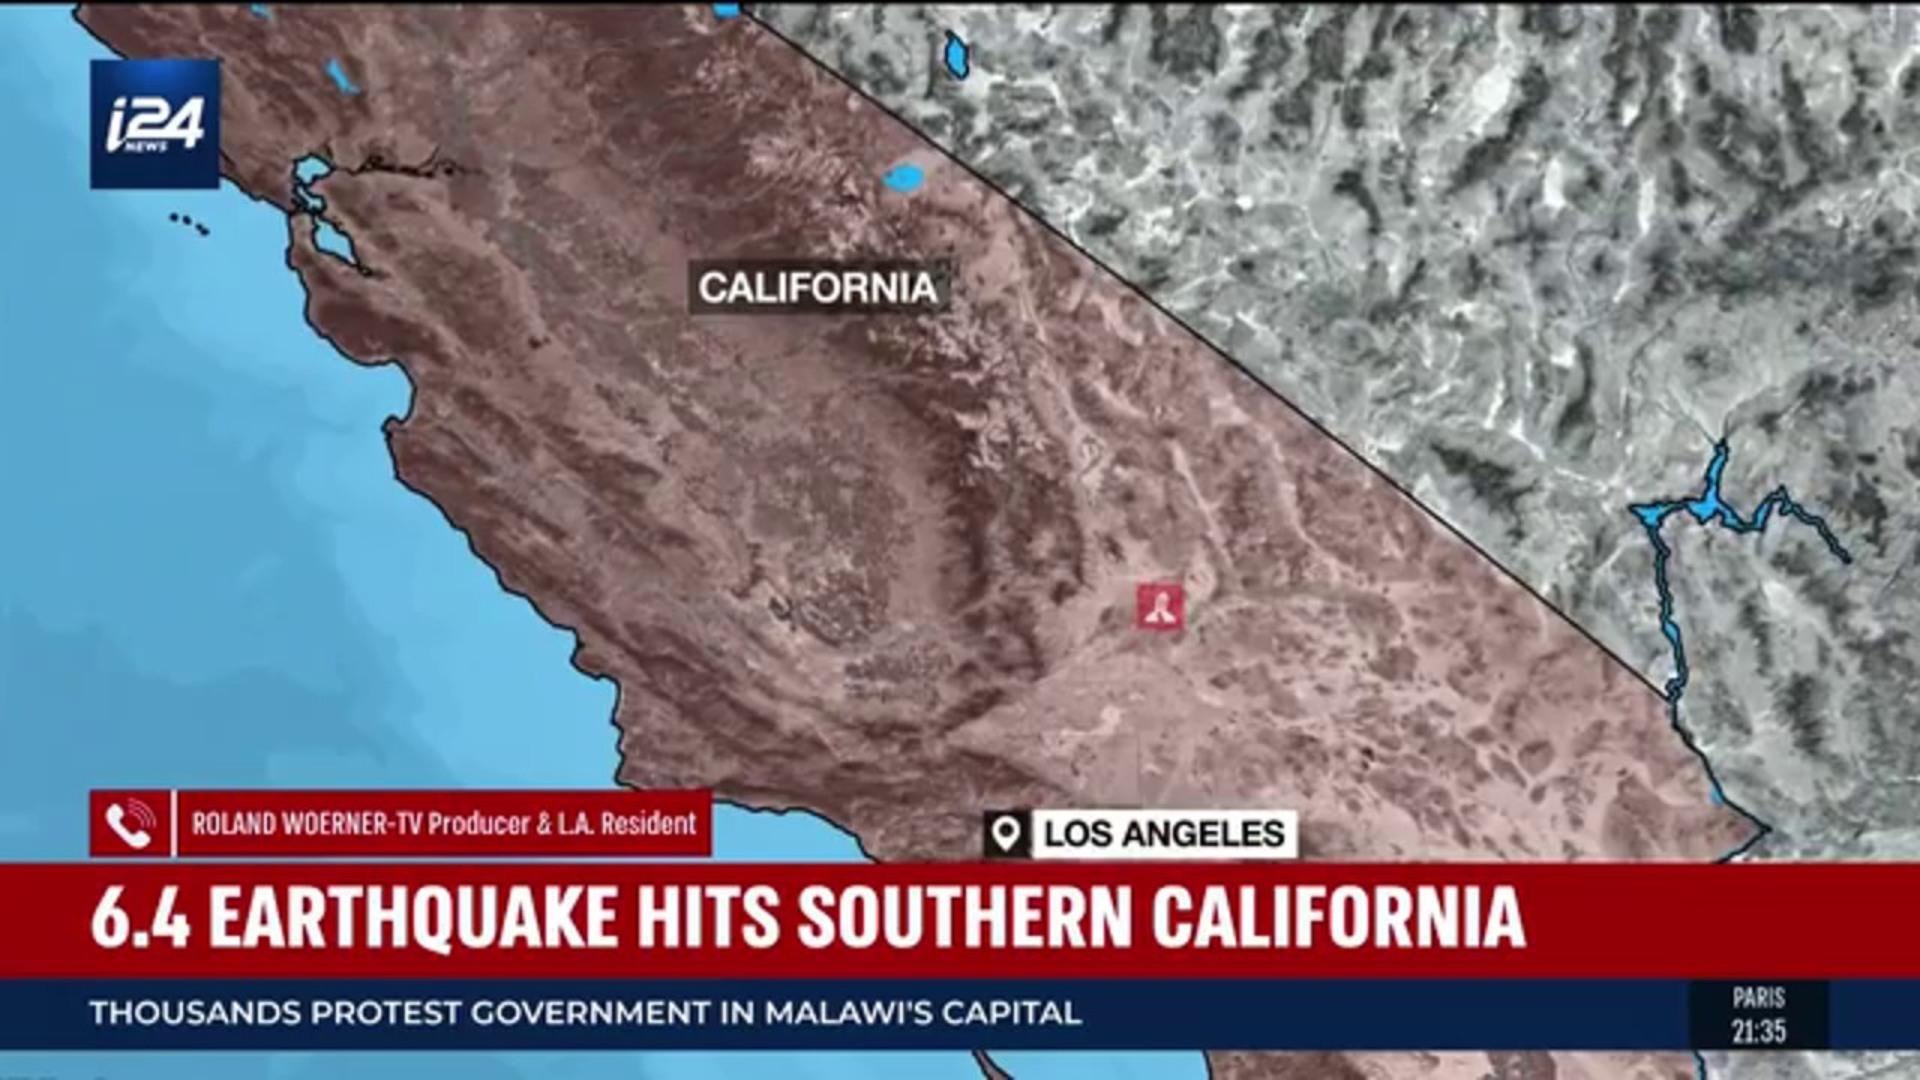 BREAKING NEWS   6 4 earthquake hits Southern California